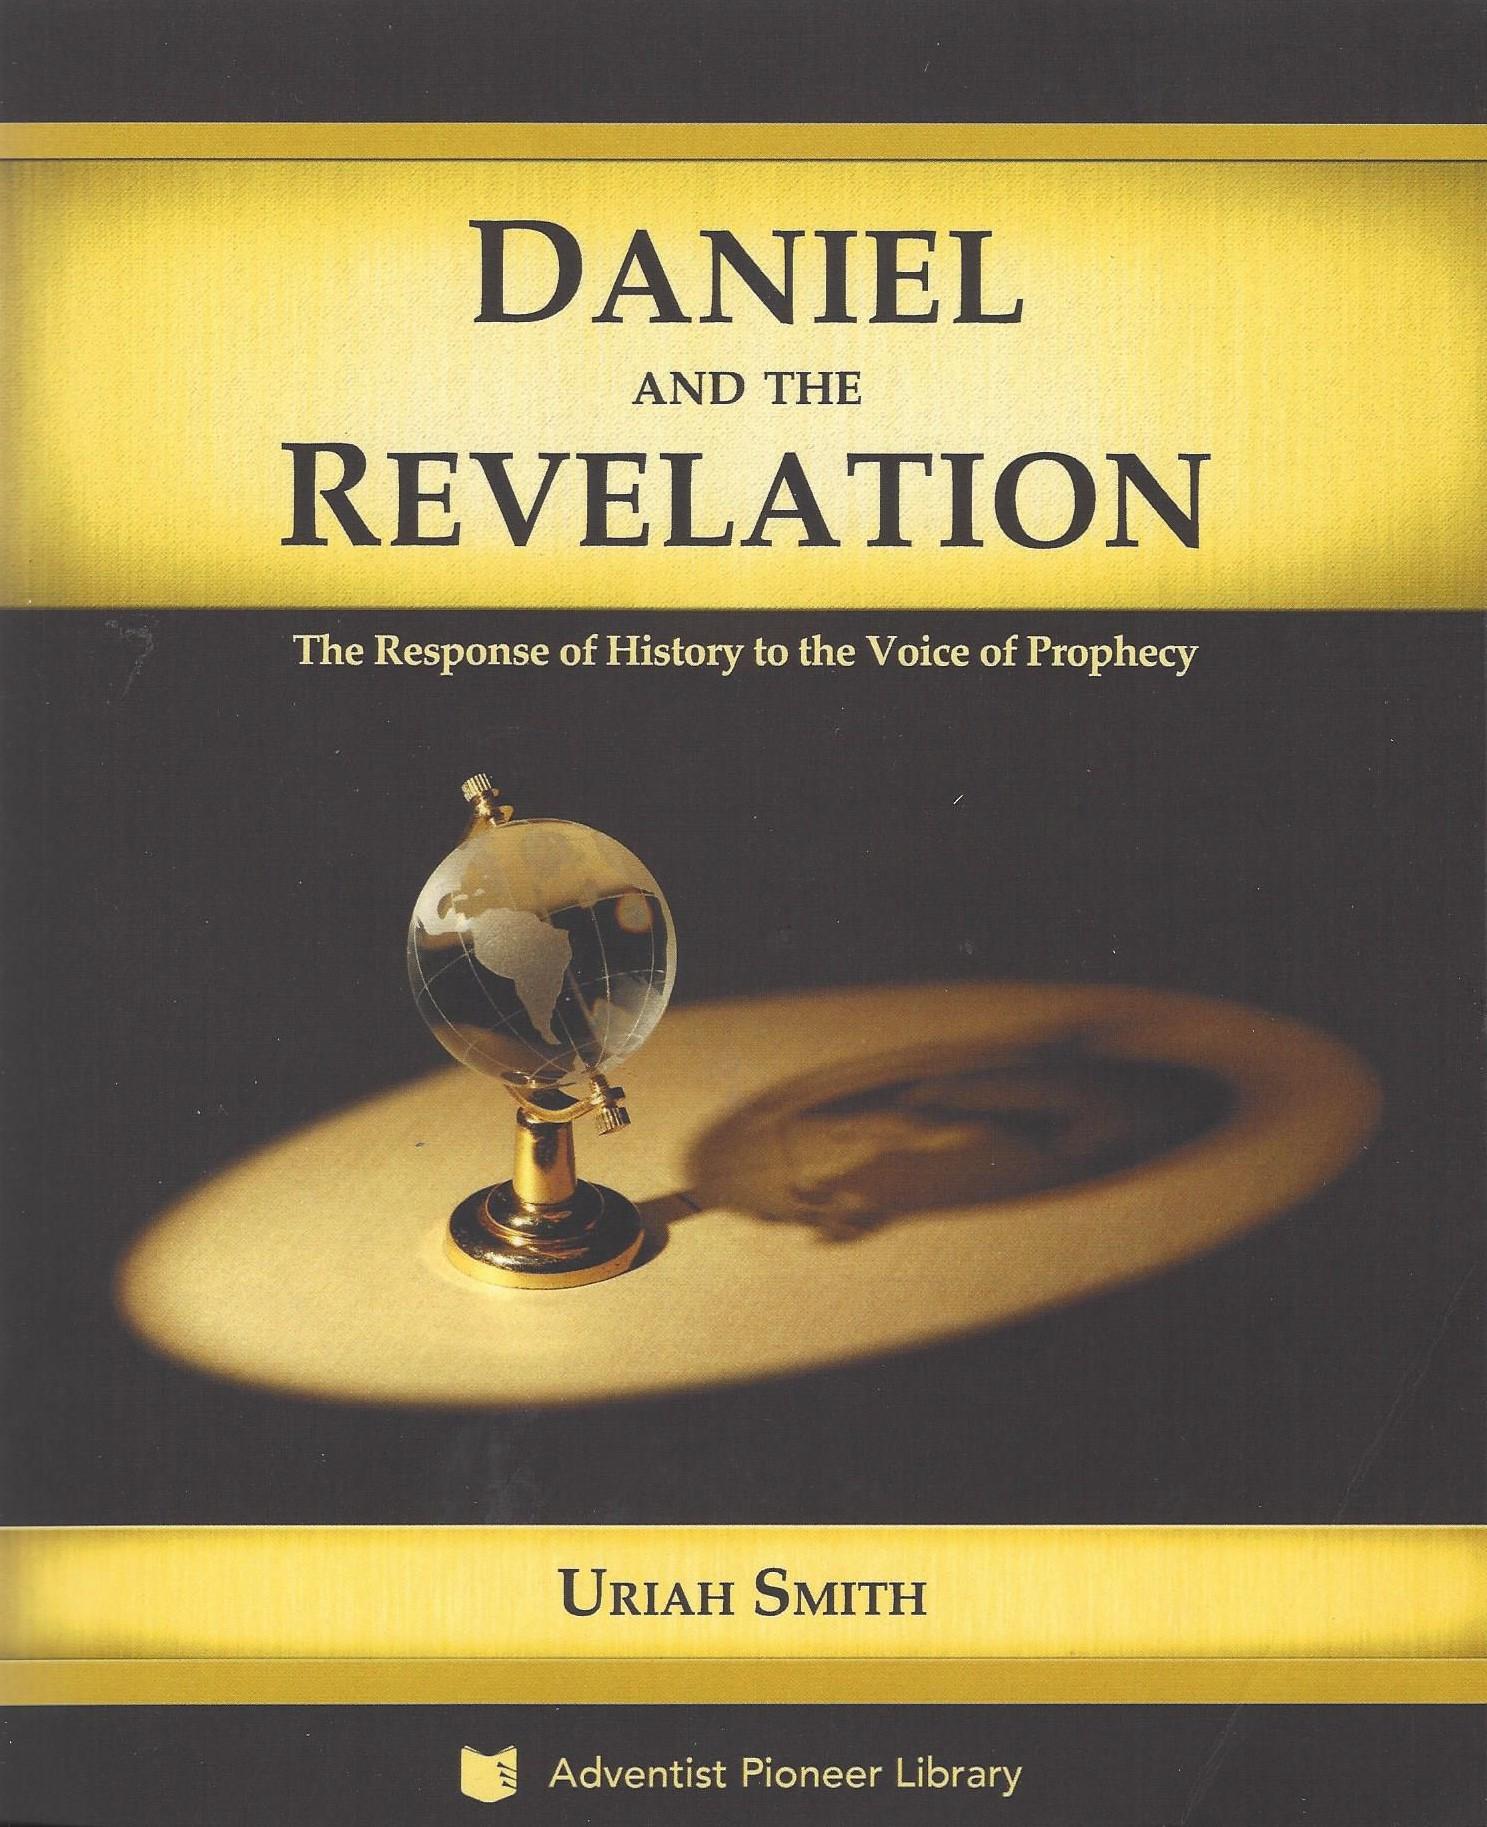 Daniel and the Revelation